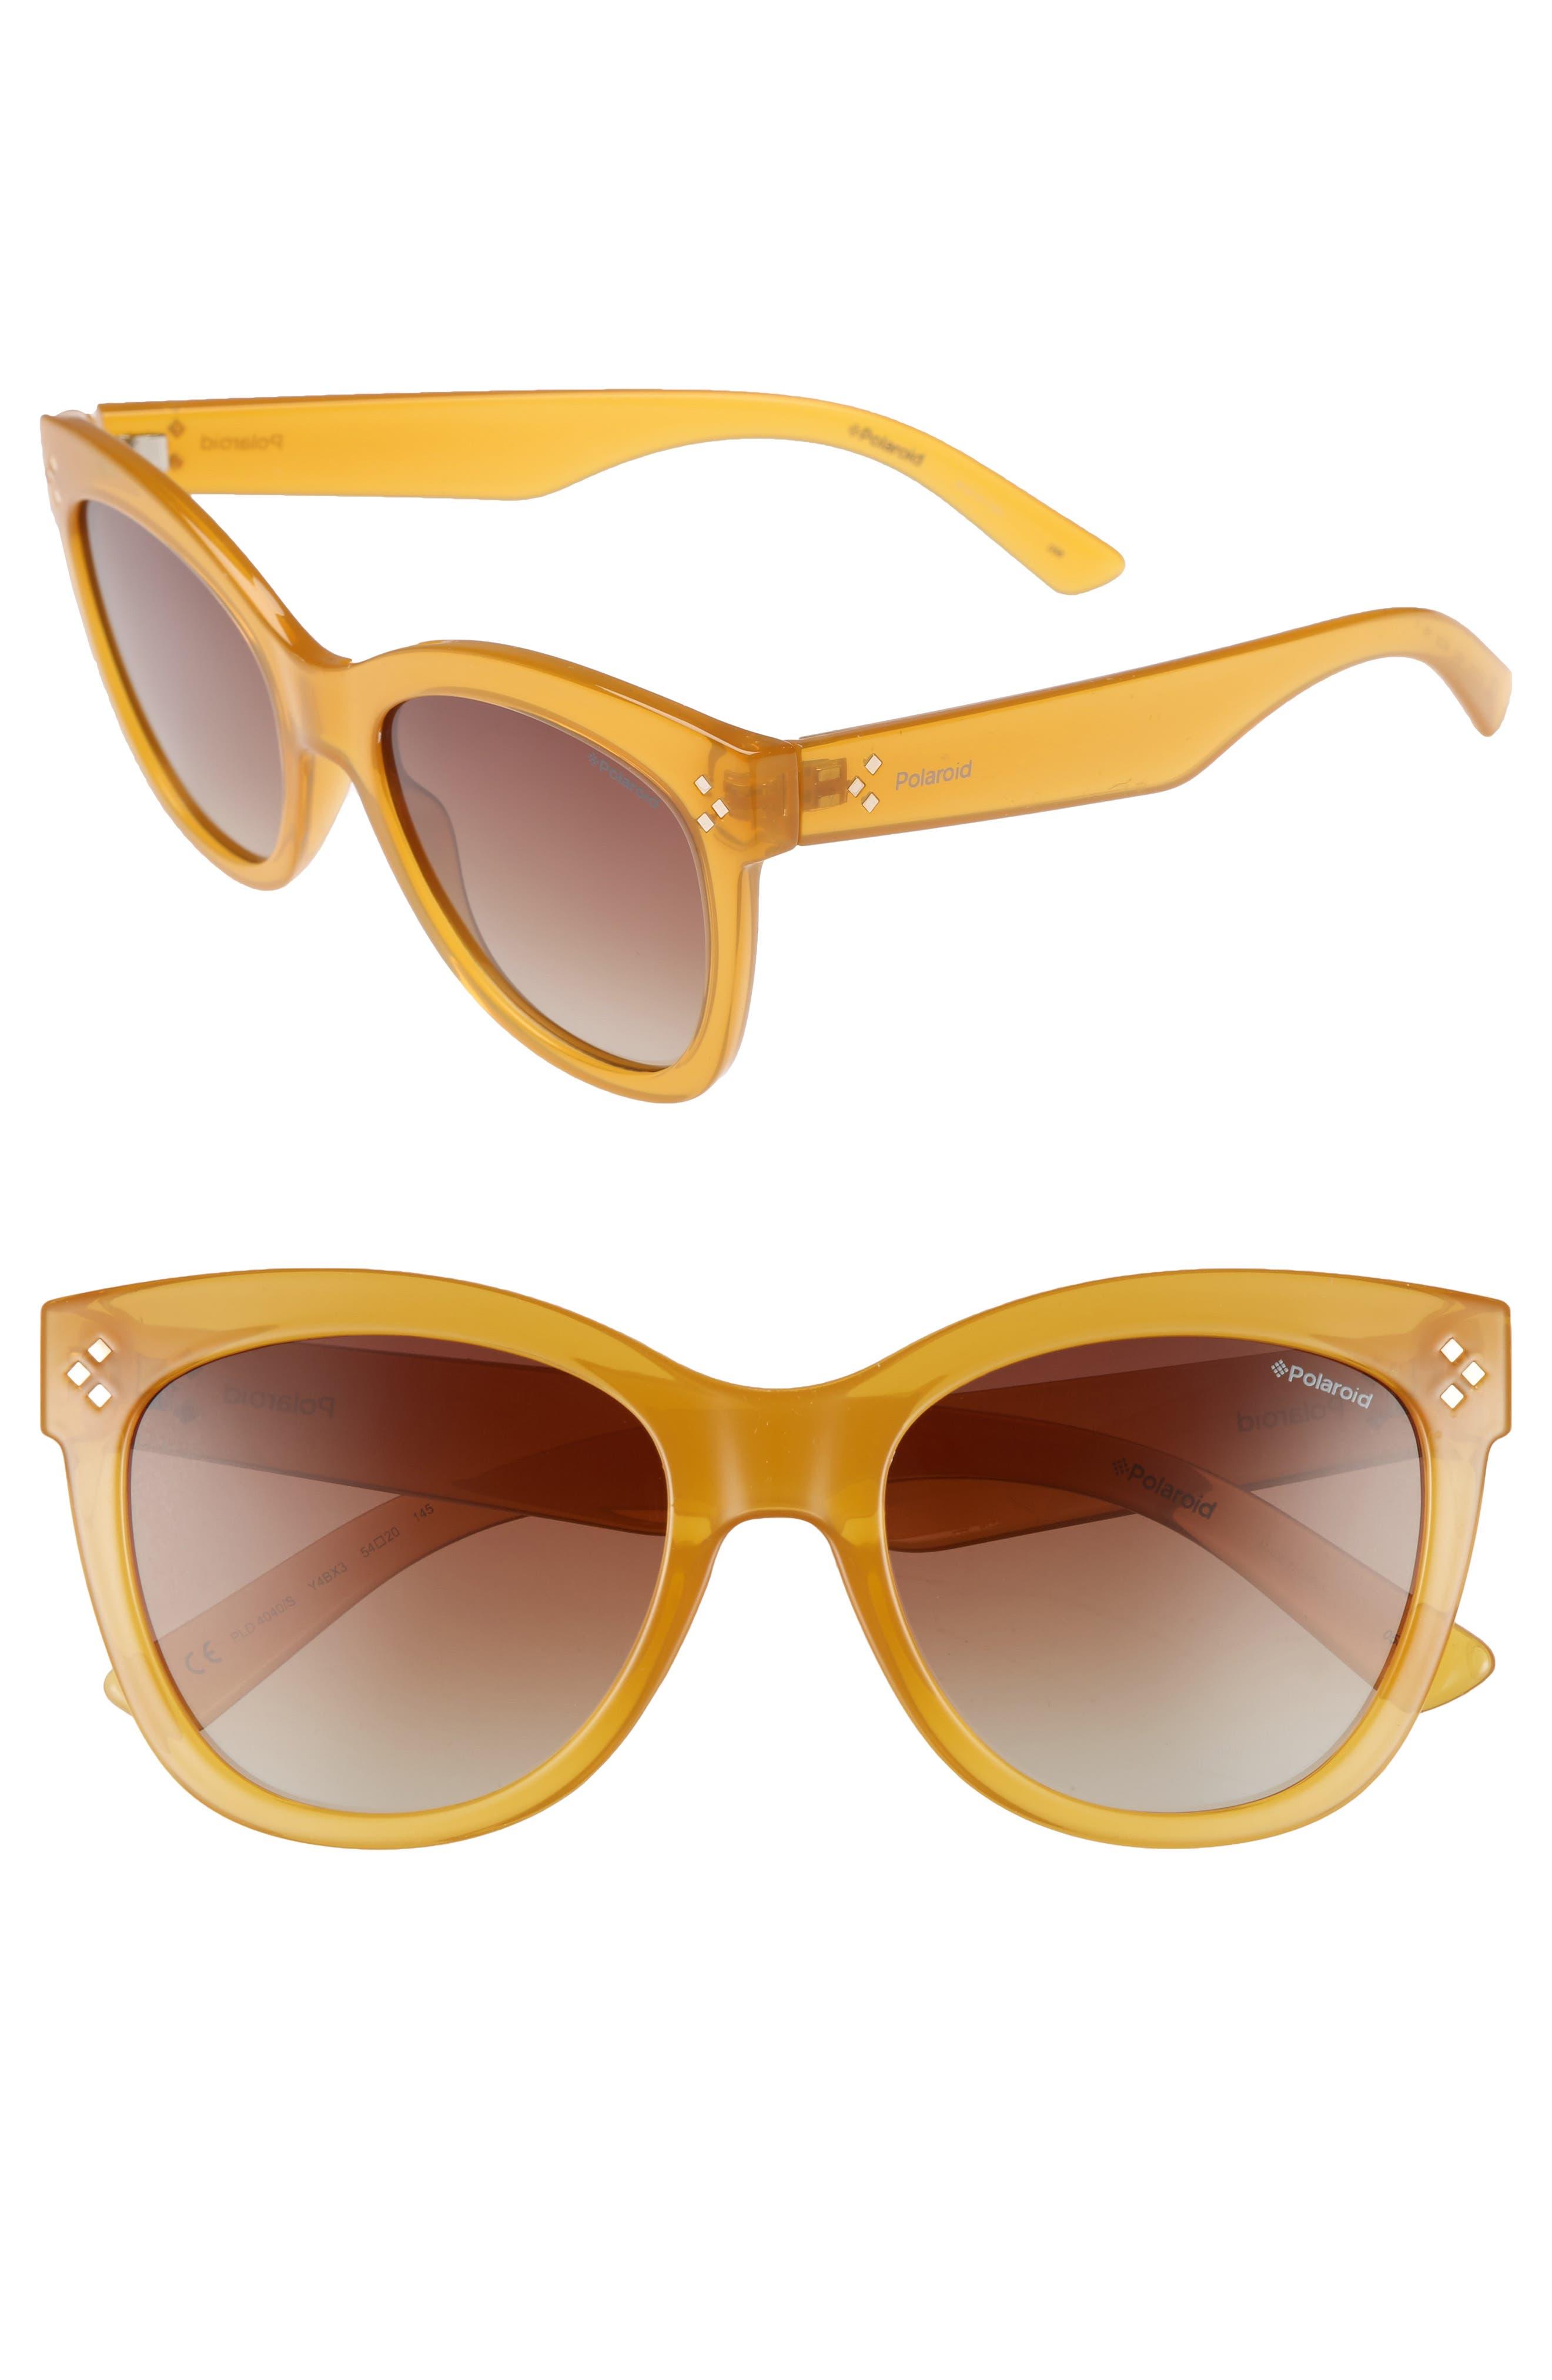 54mm Polarized Sunglasses,                             Main thumbnail 1, color,                             700